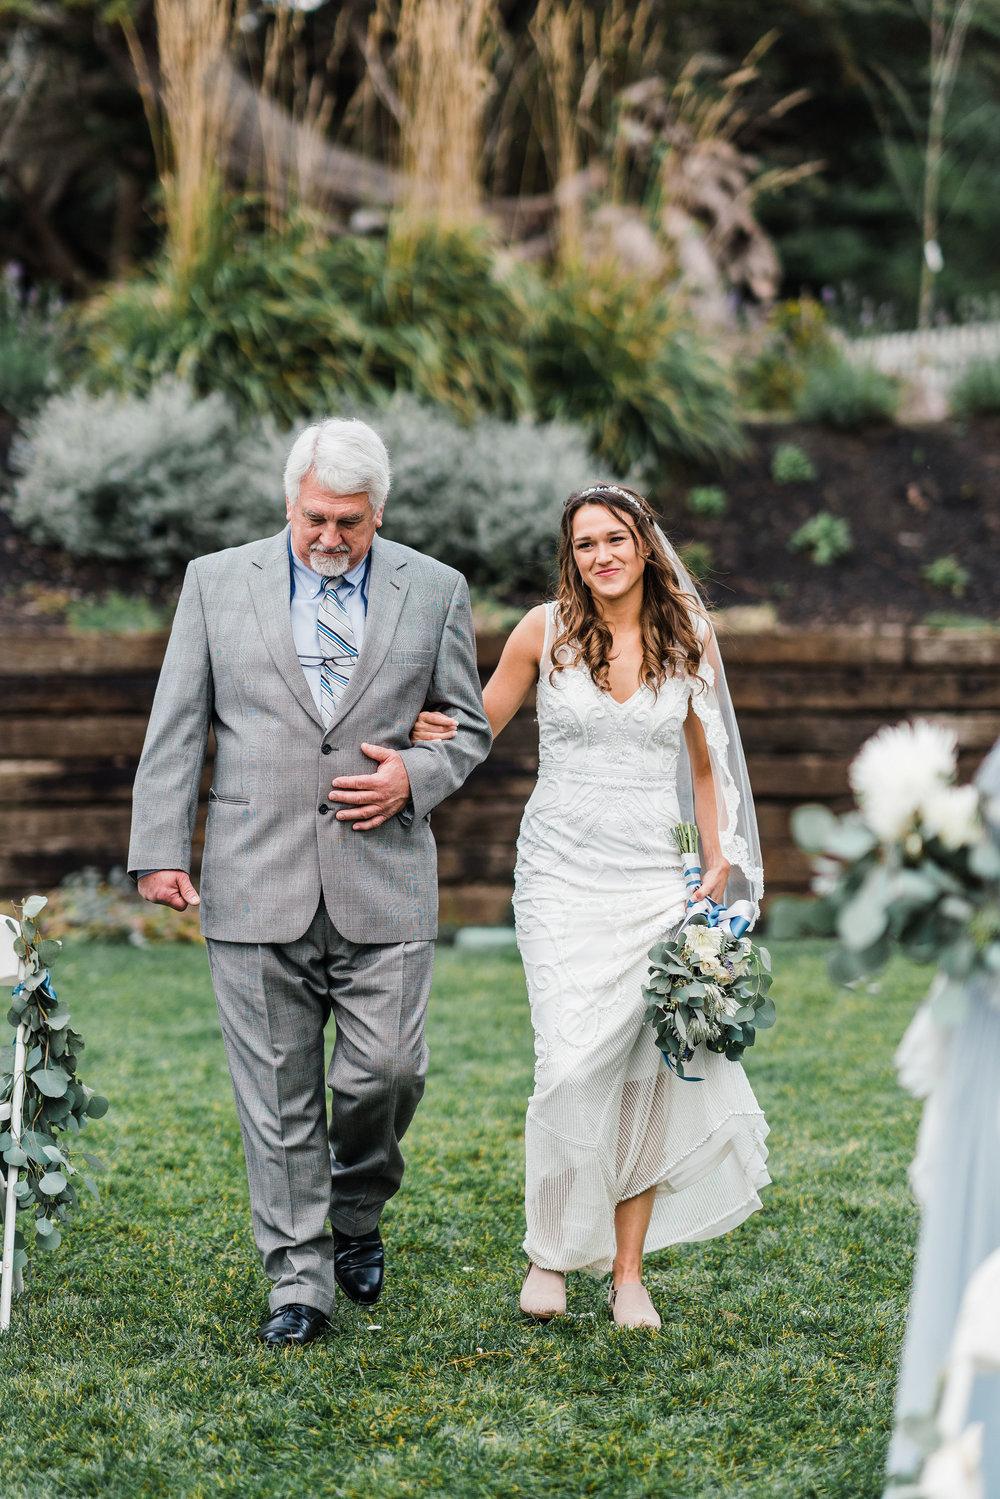 switzer-farm-wedding-westport-brandon-bibbins-photograhy-fine-art-056.jpg